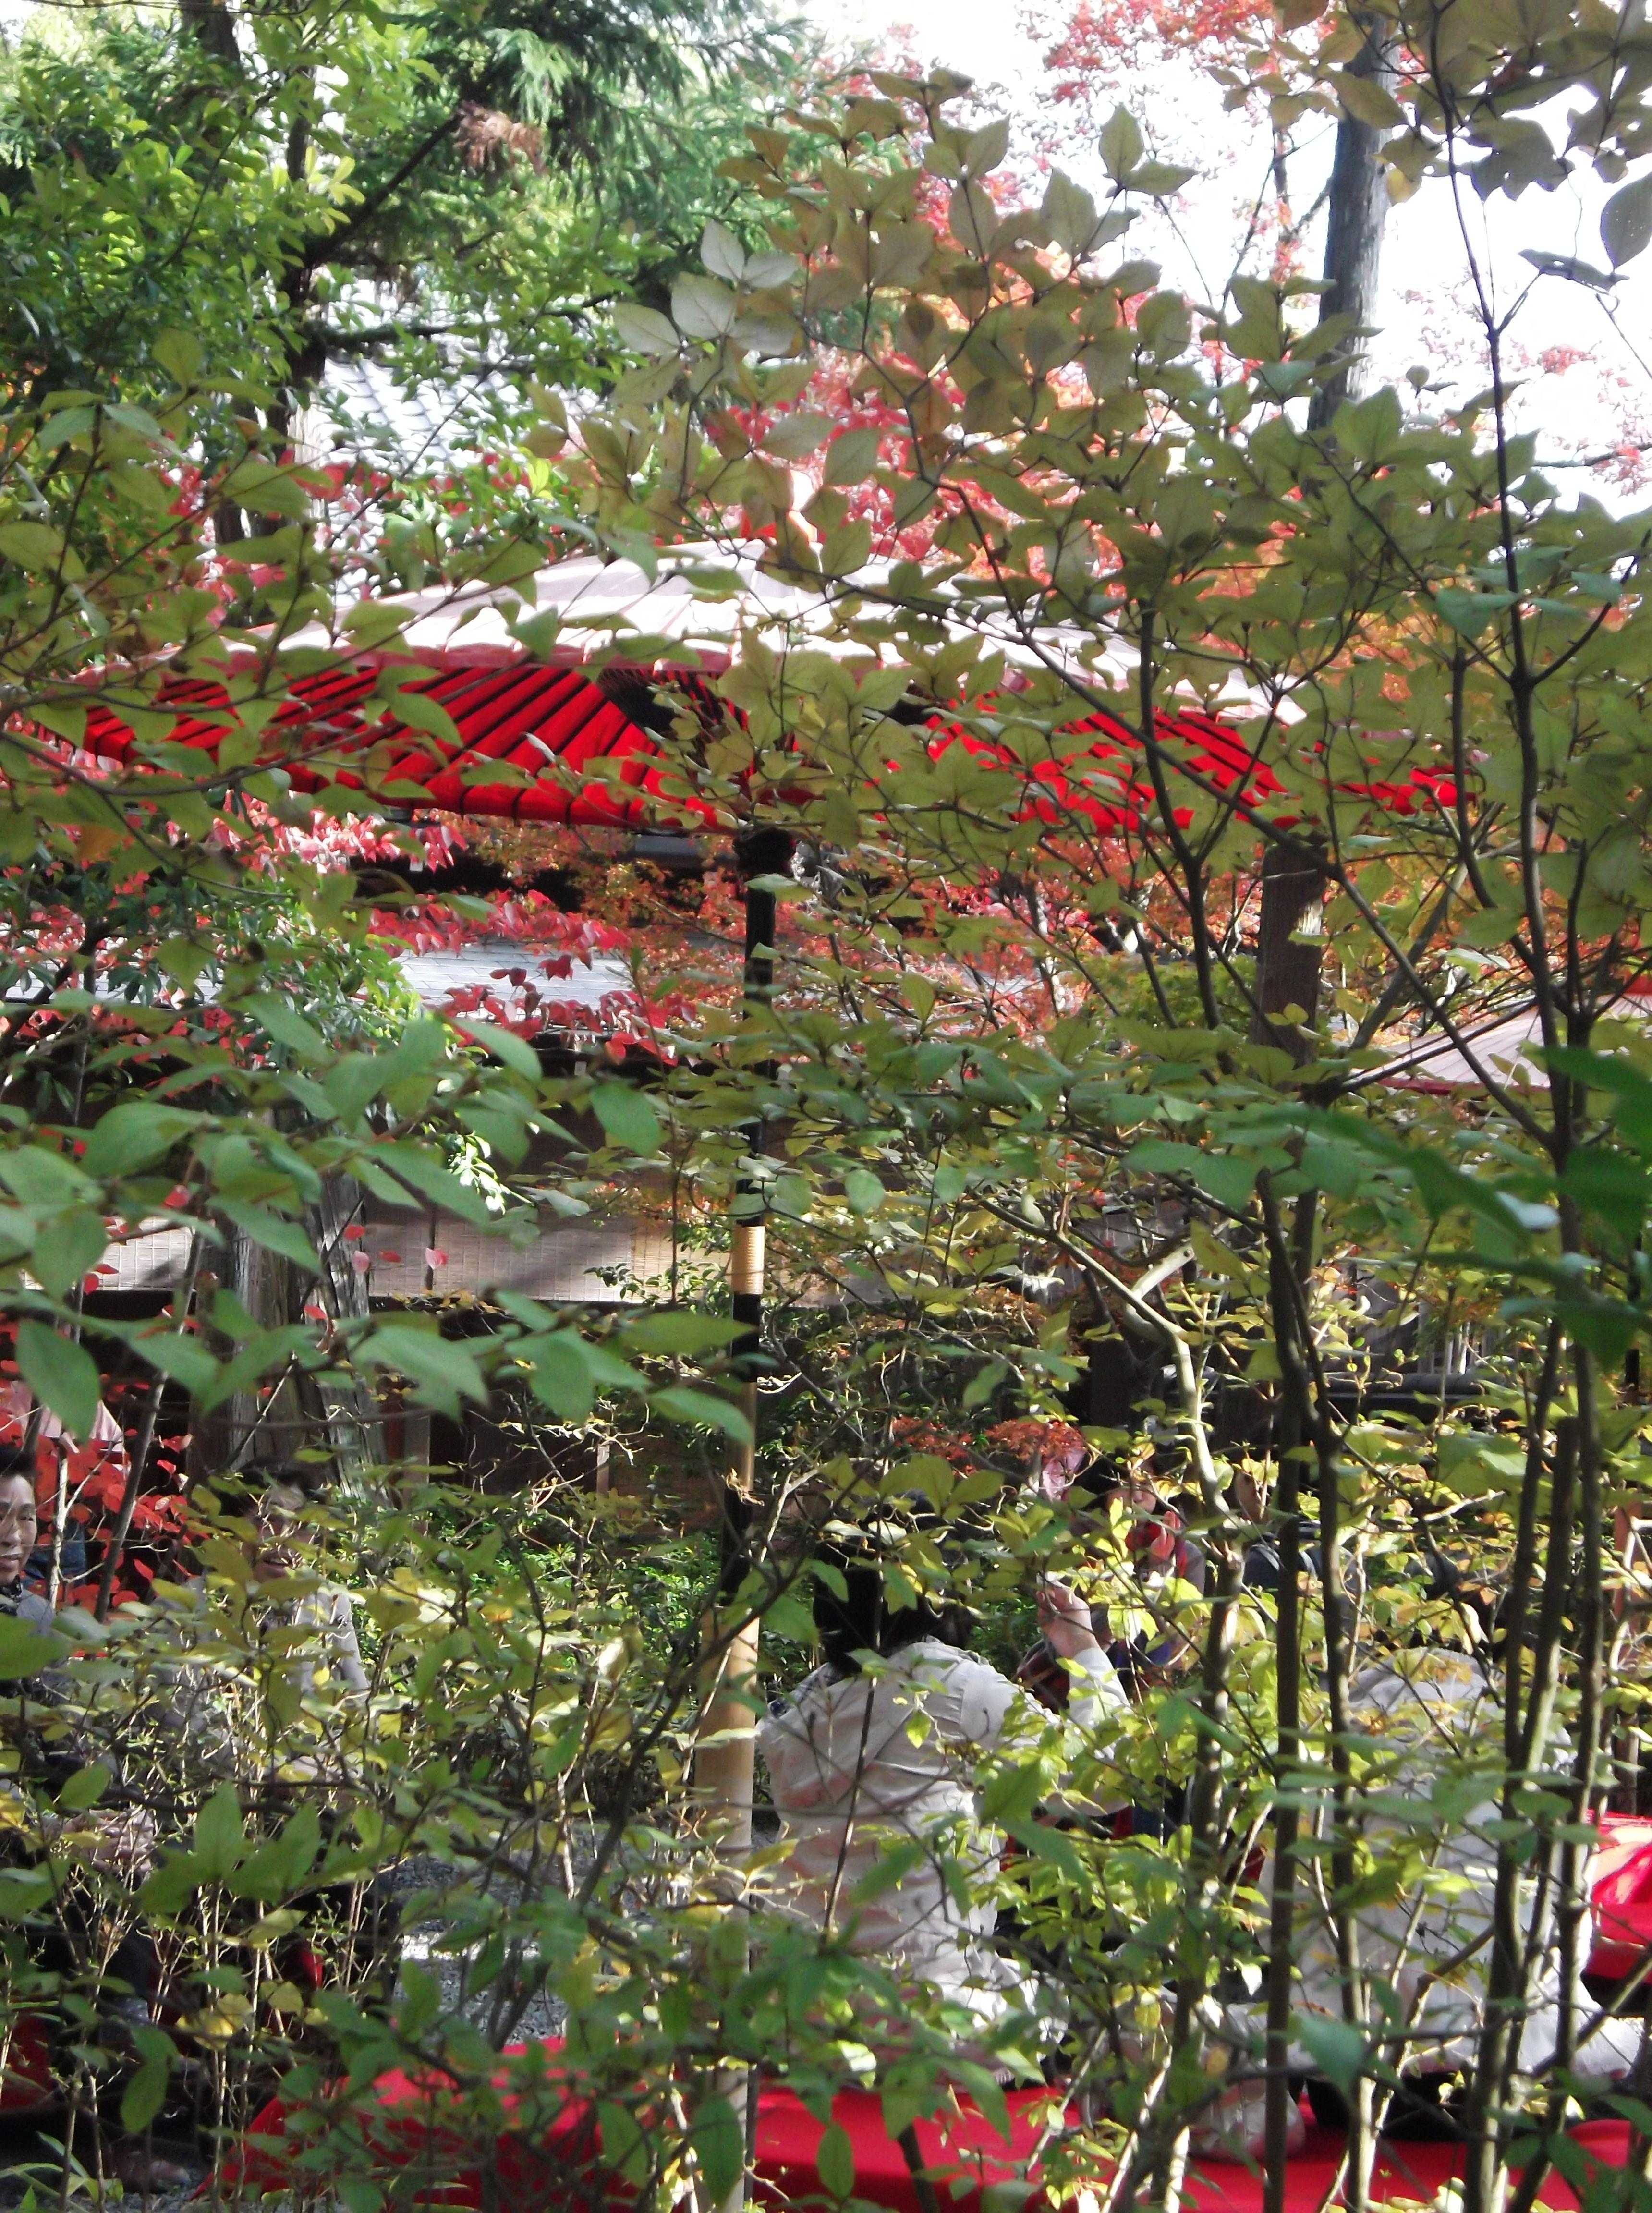 Glimpse of Parasol in Japanese Tea Garden, Kyoto | Japanese Gardens ...